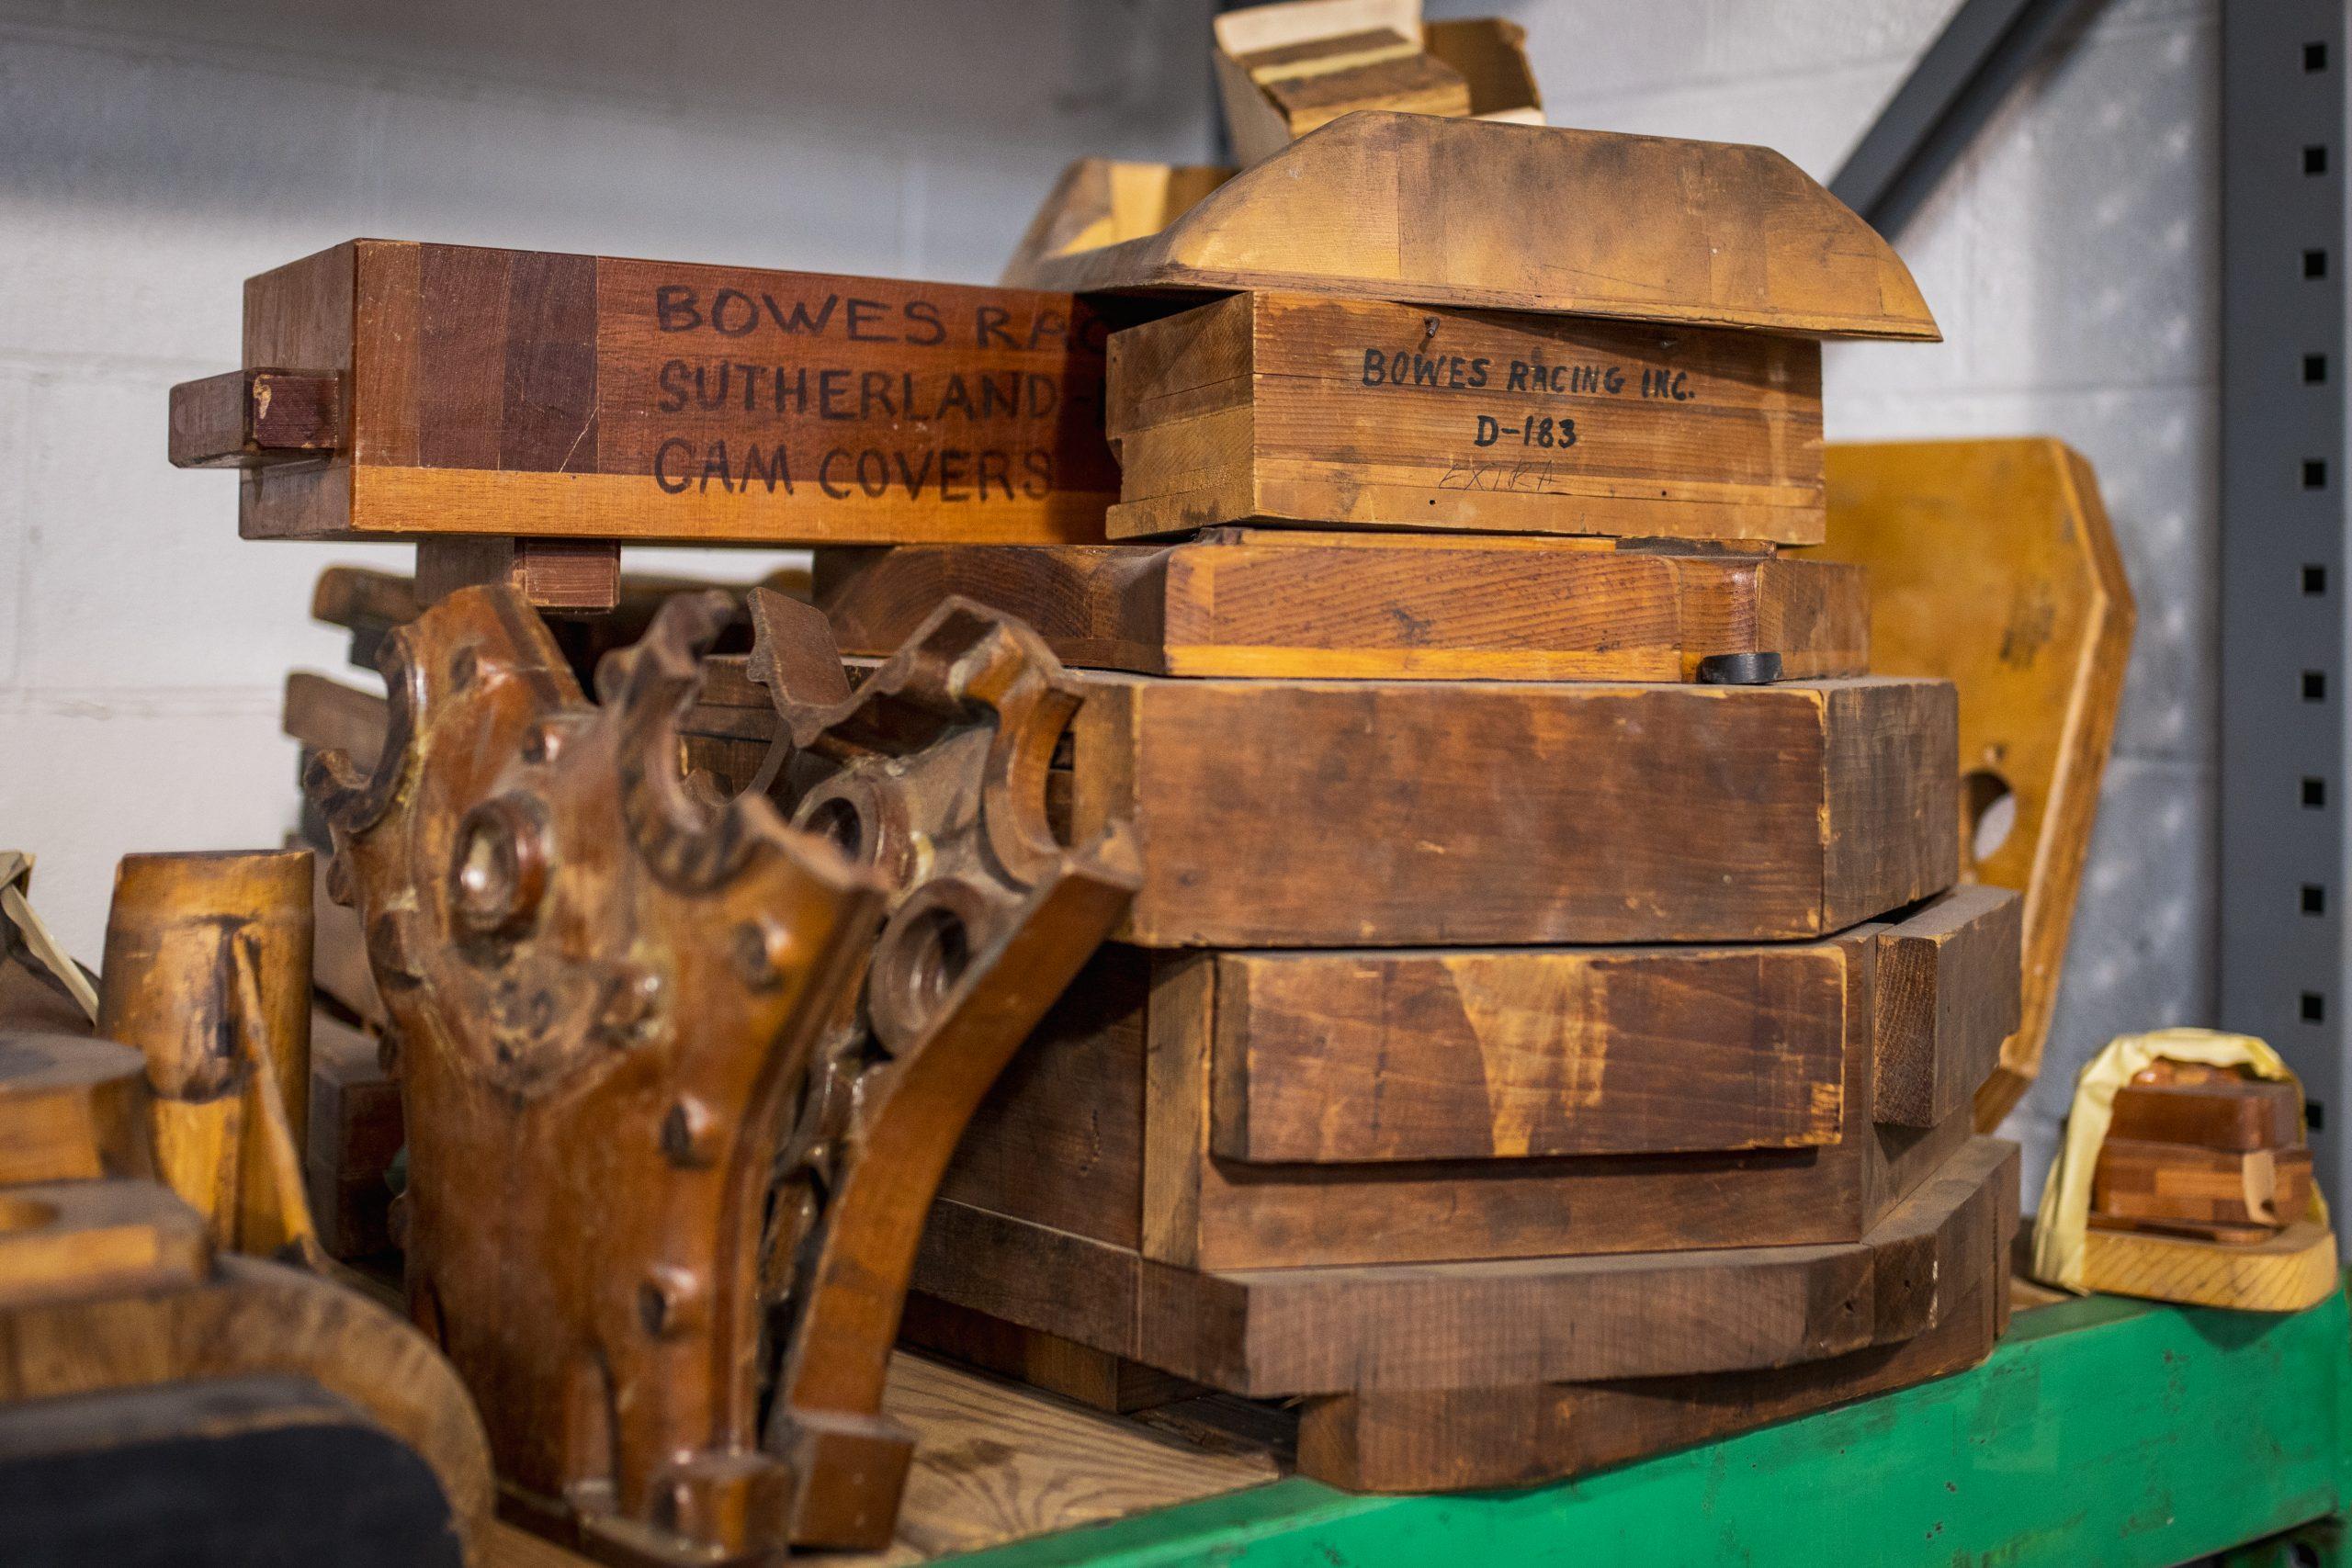 vintage bowes racing parts